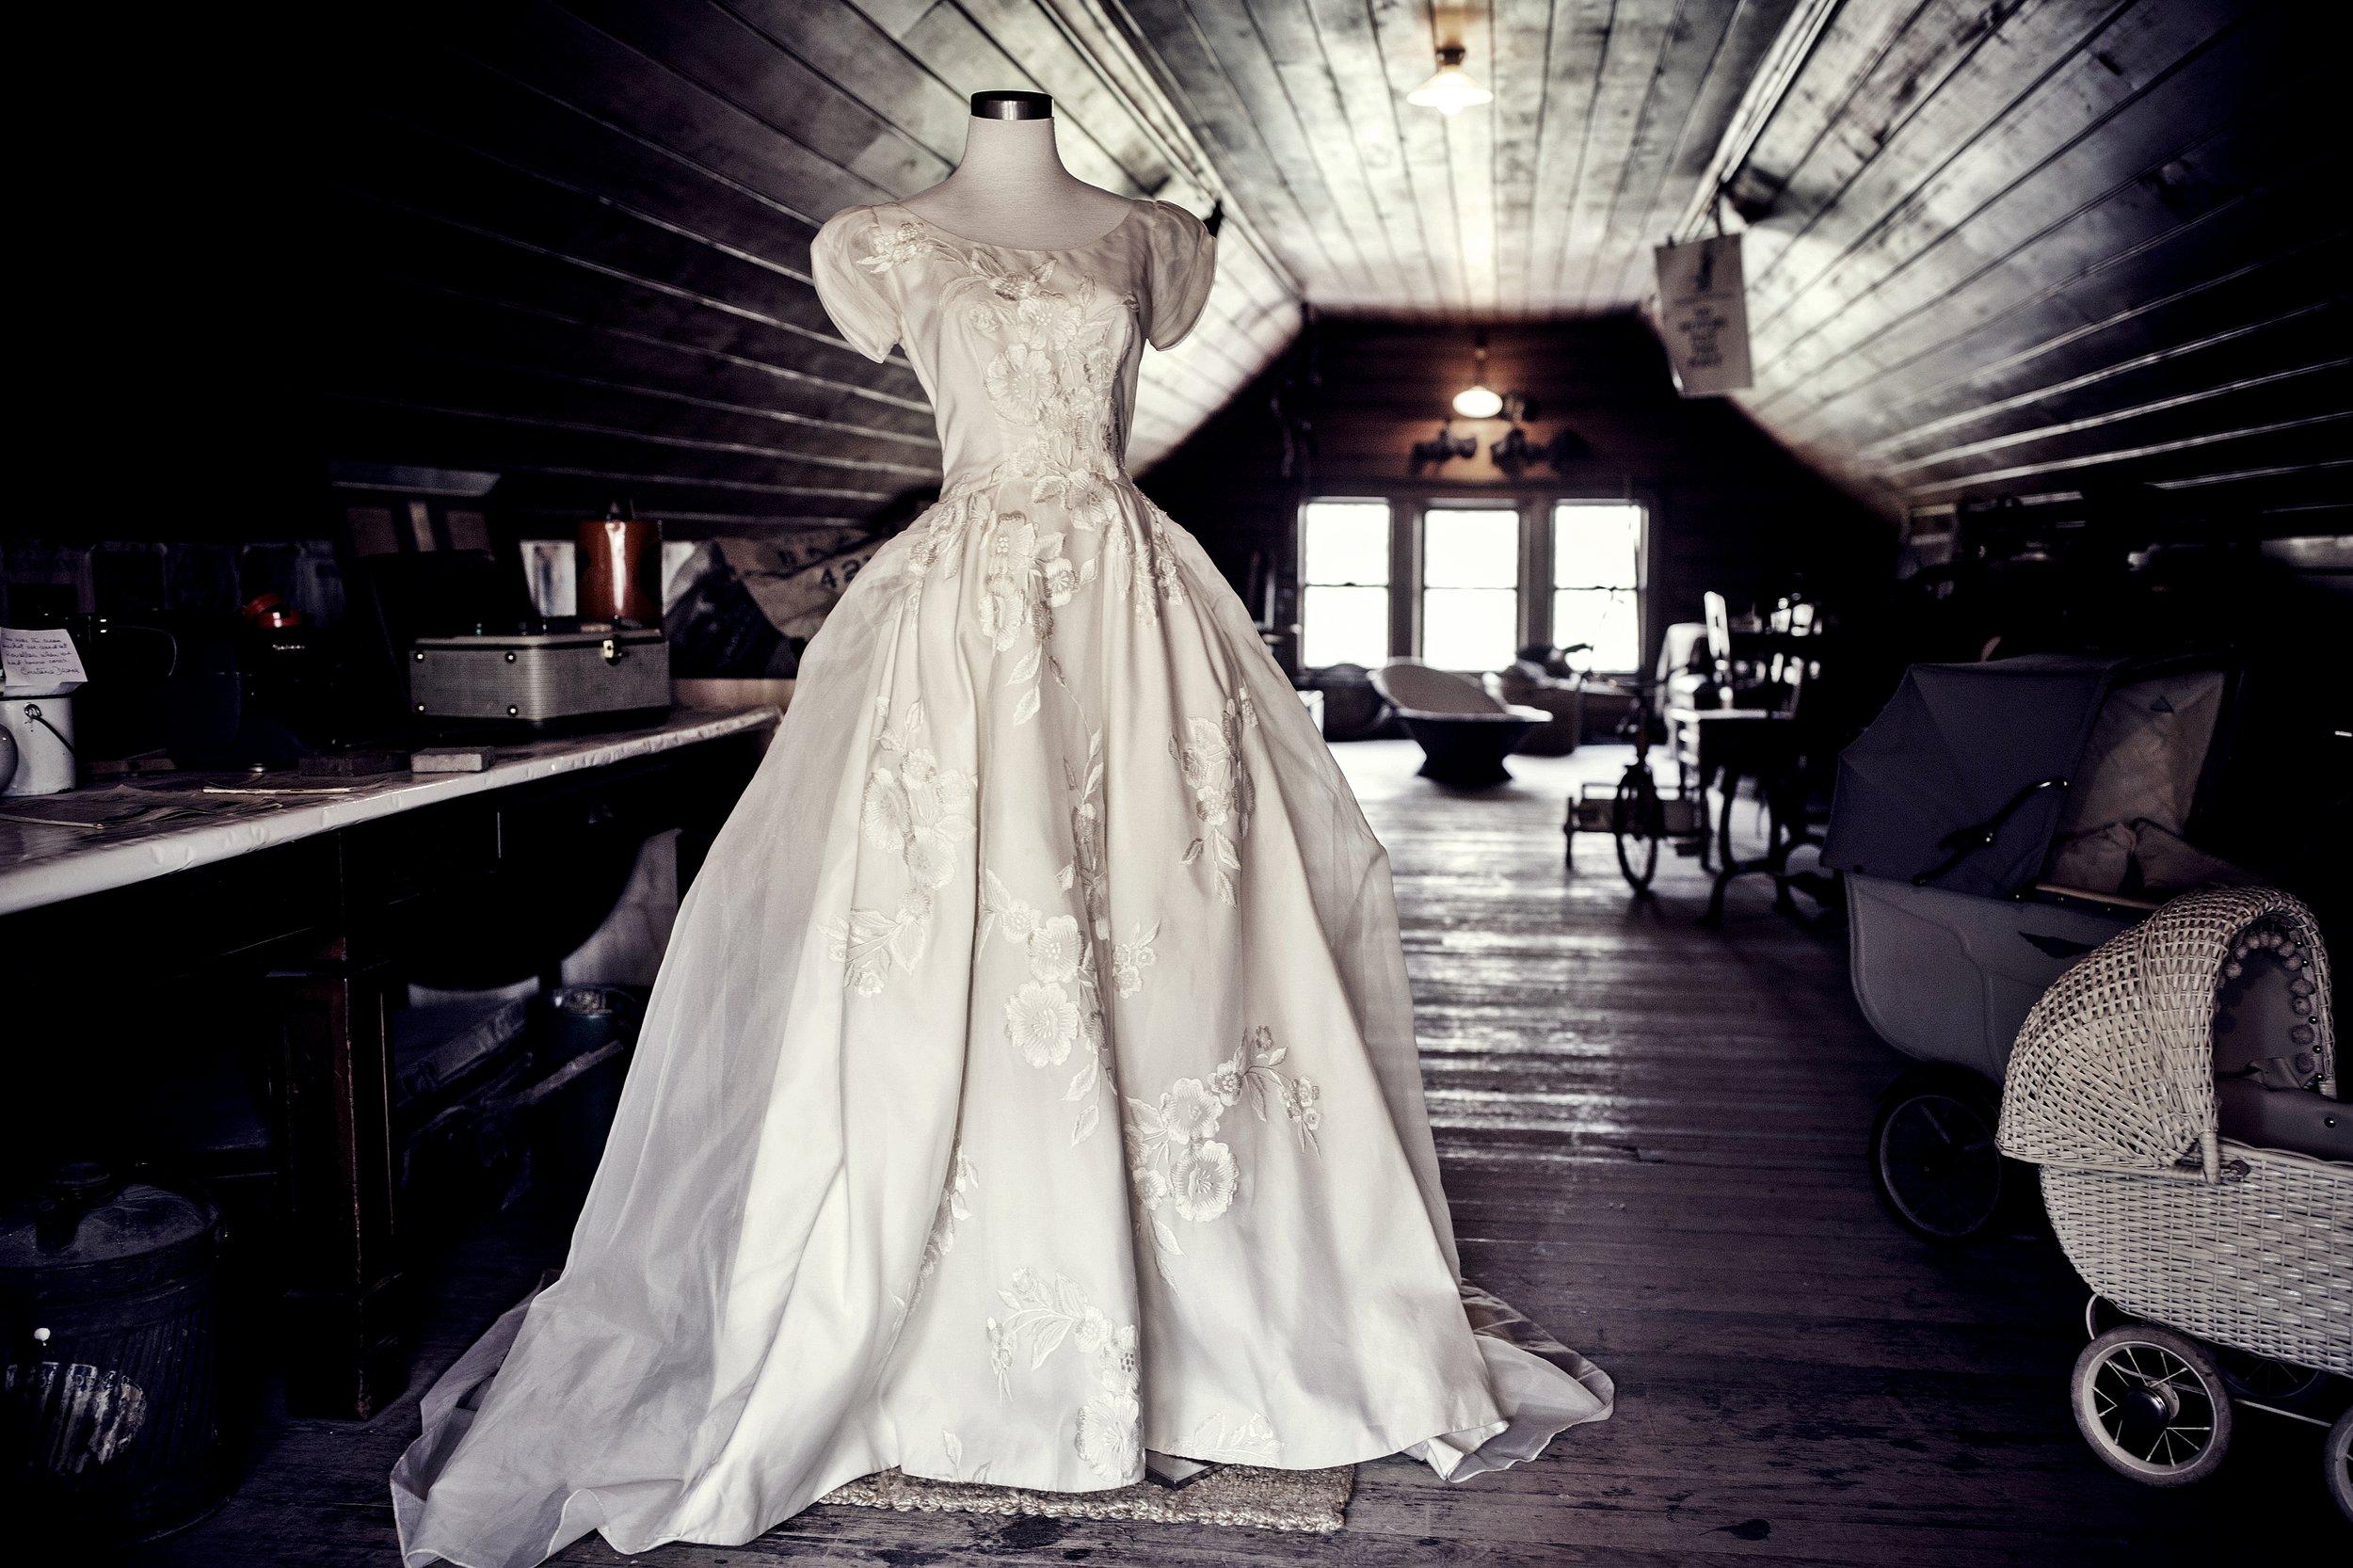 Riccarton House Attic - open wedding day - Christchurch bride - Johannes van kaan Photography